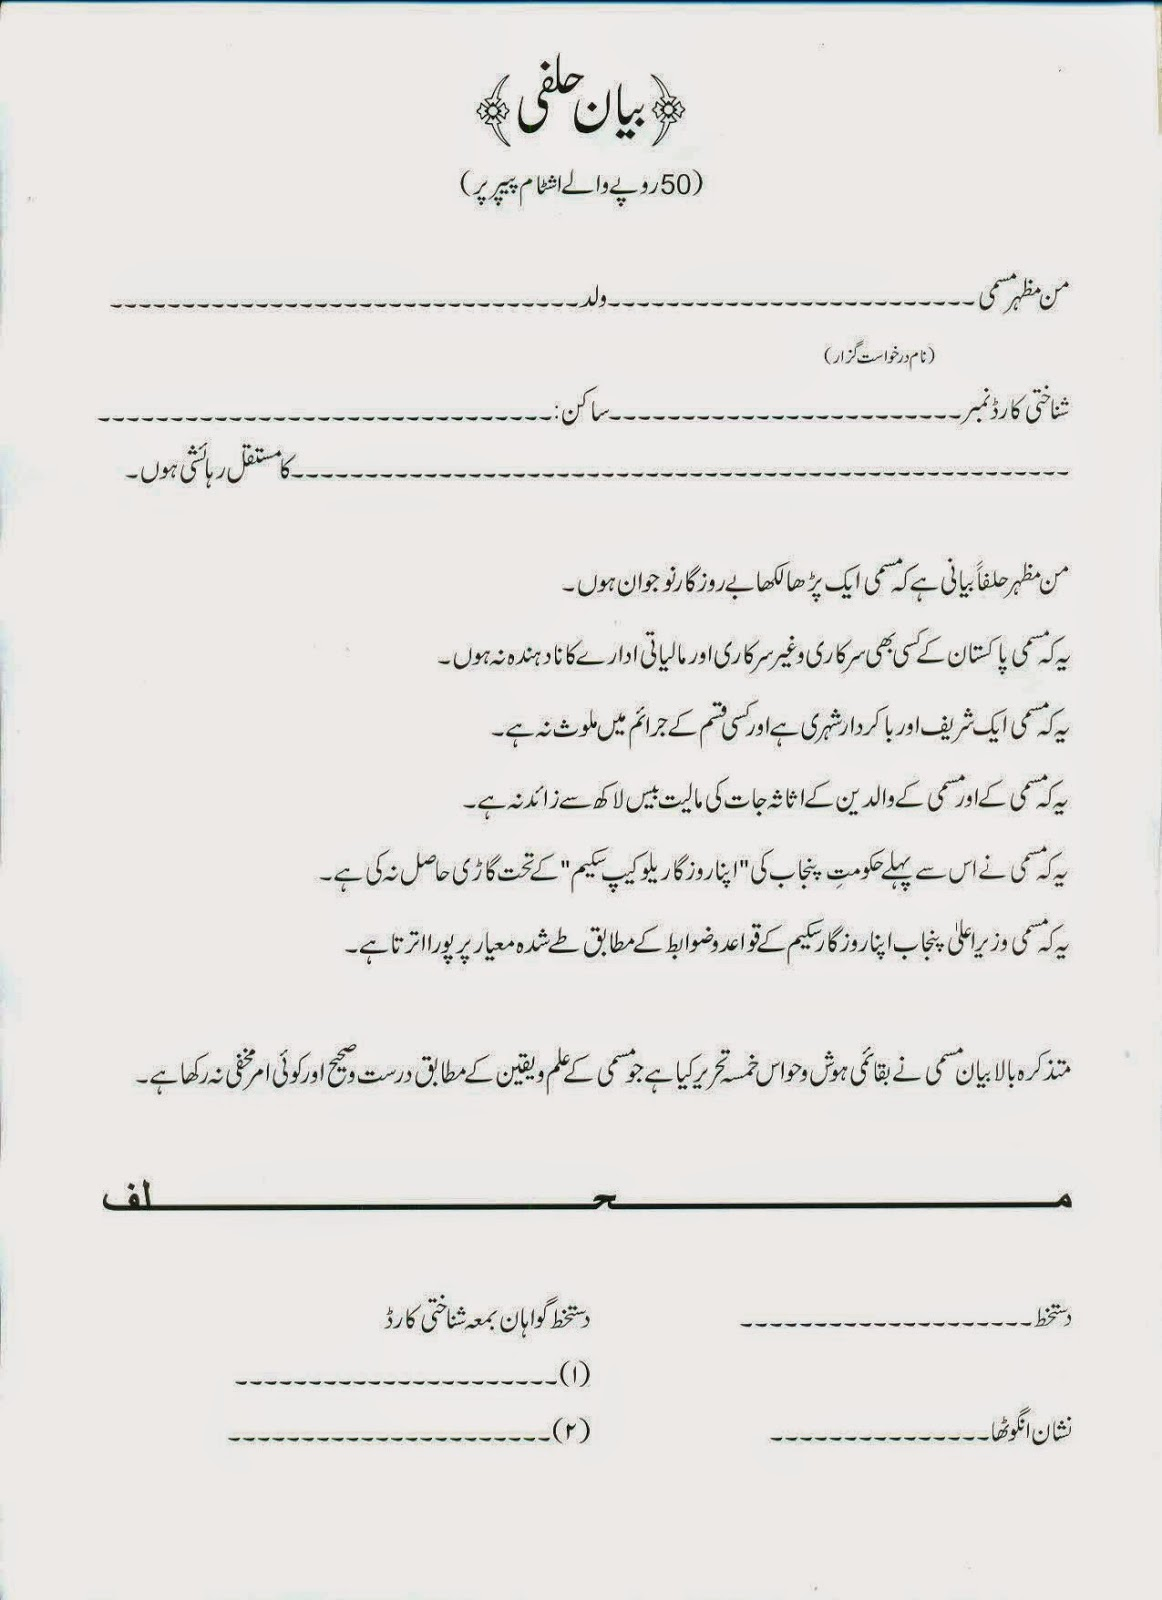 Affidavit-1 Job Application Form In Urdu on free generic, blank generic, part time,